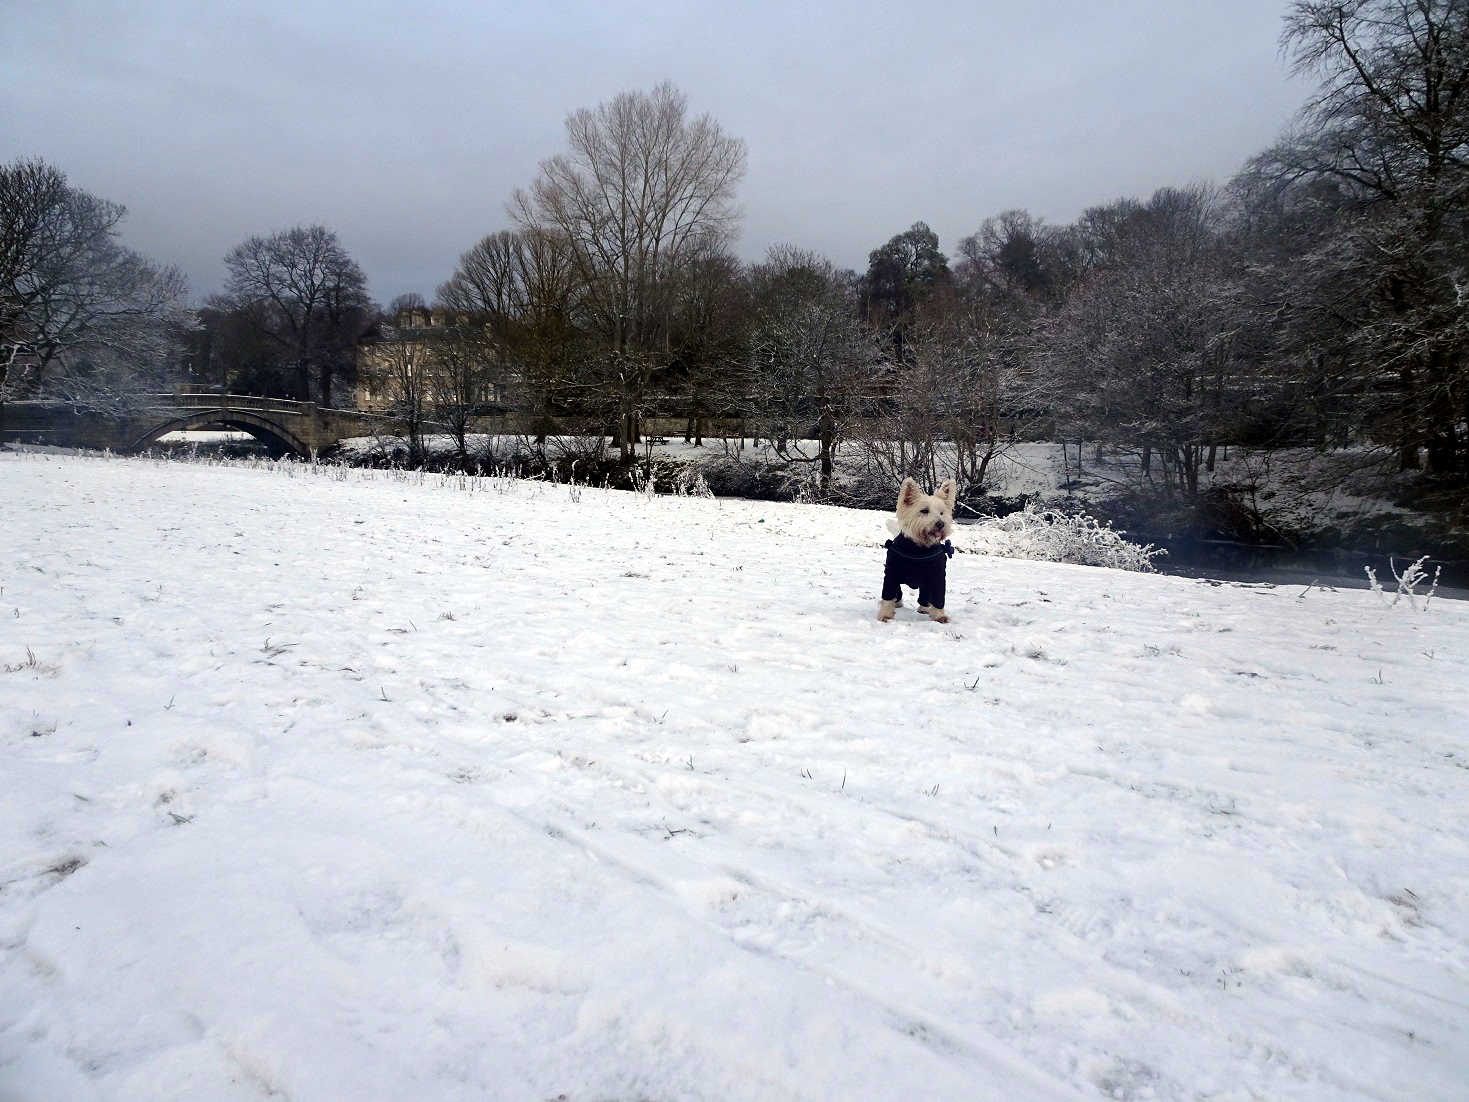 poppysocks at pollock park in the snow